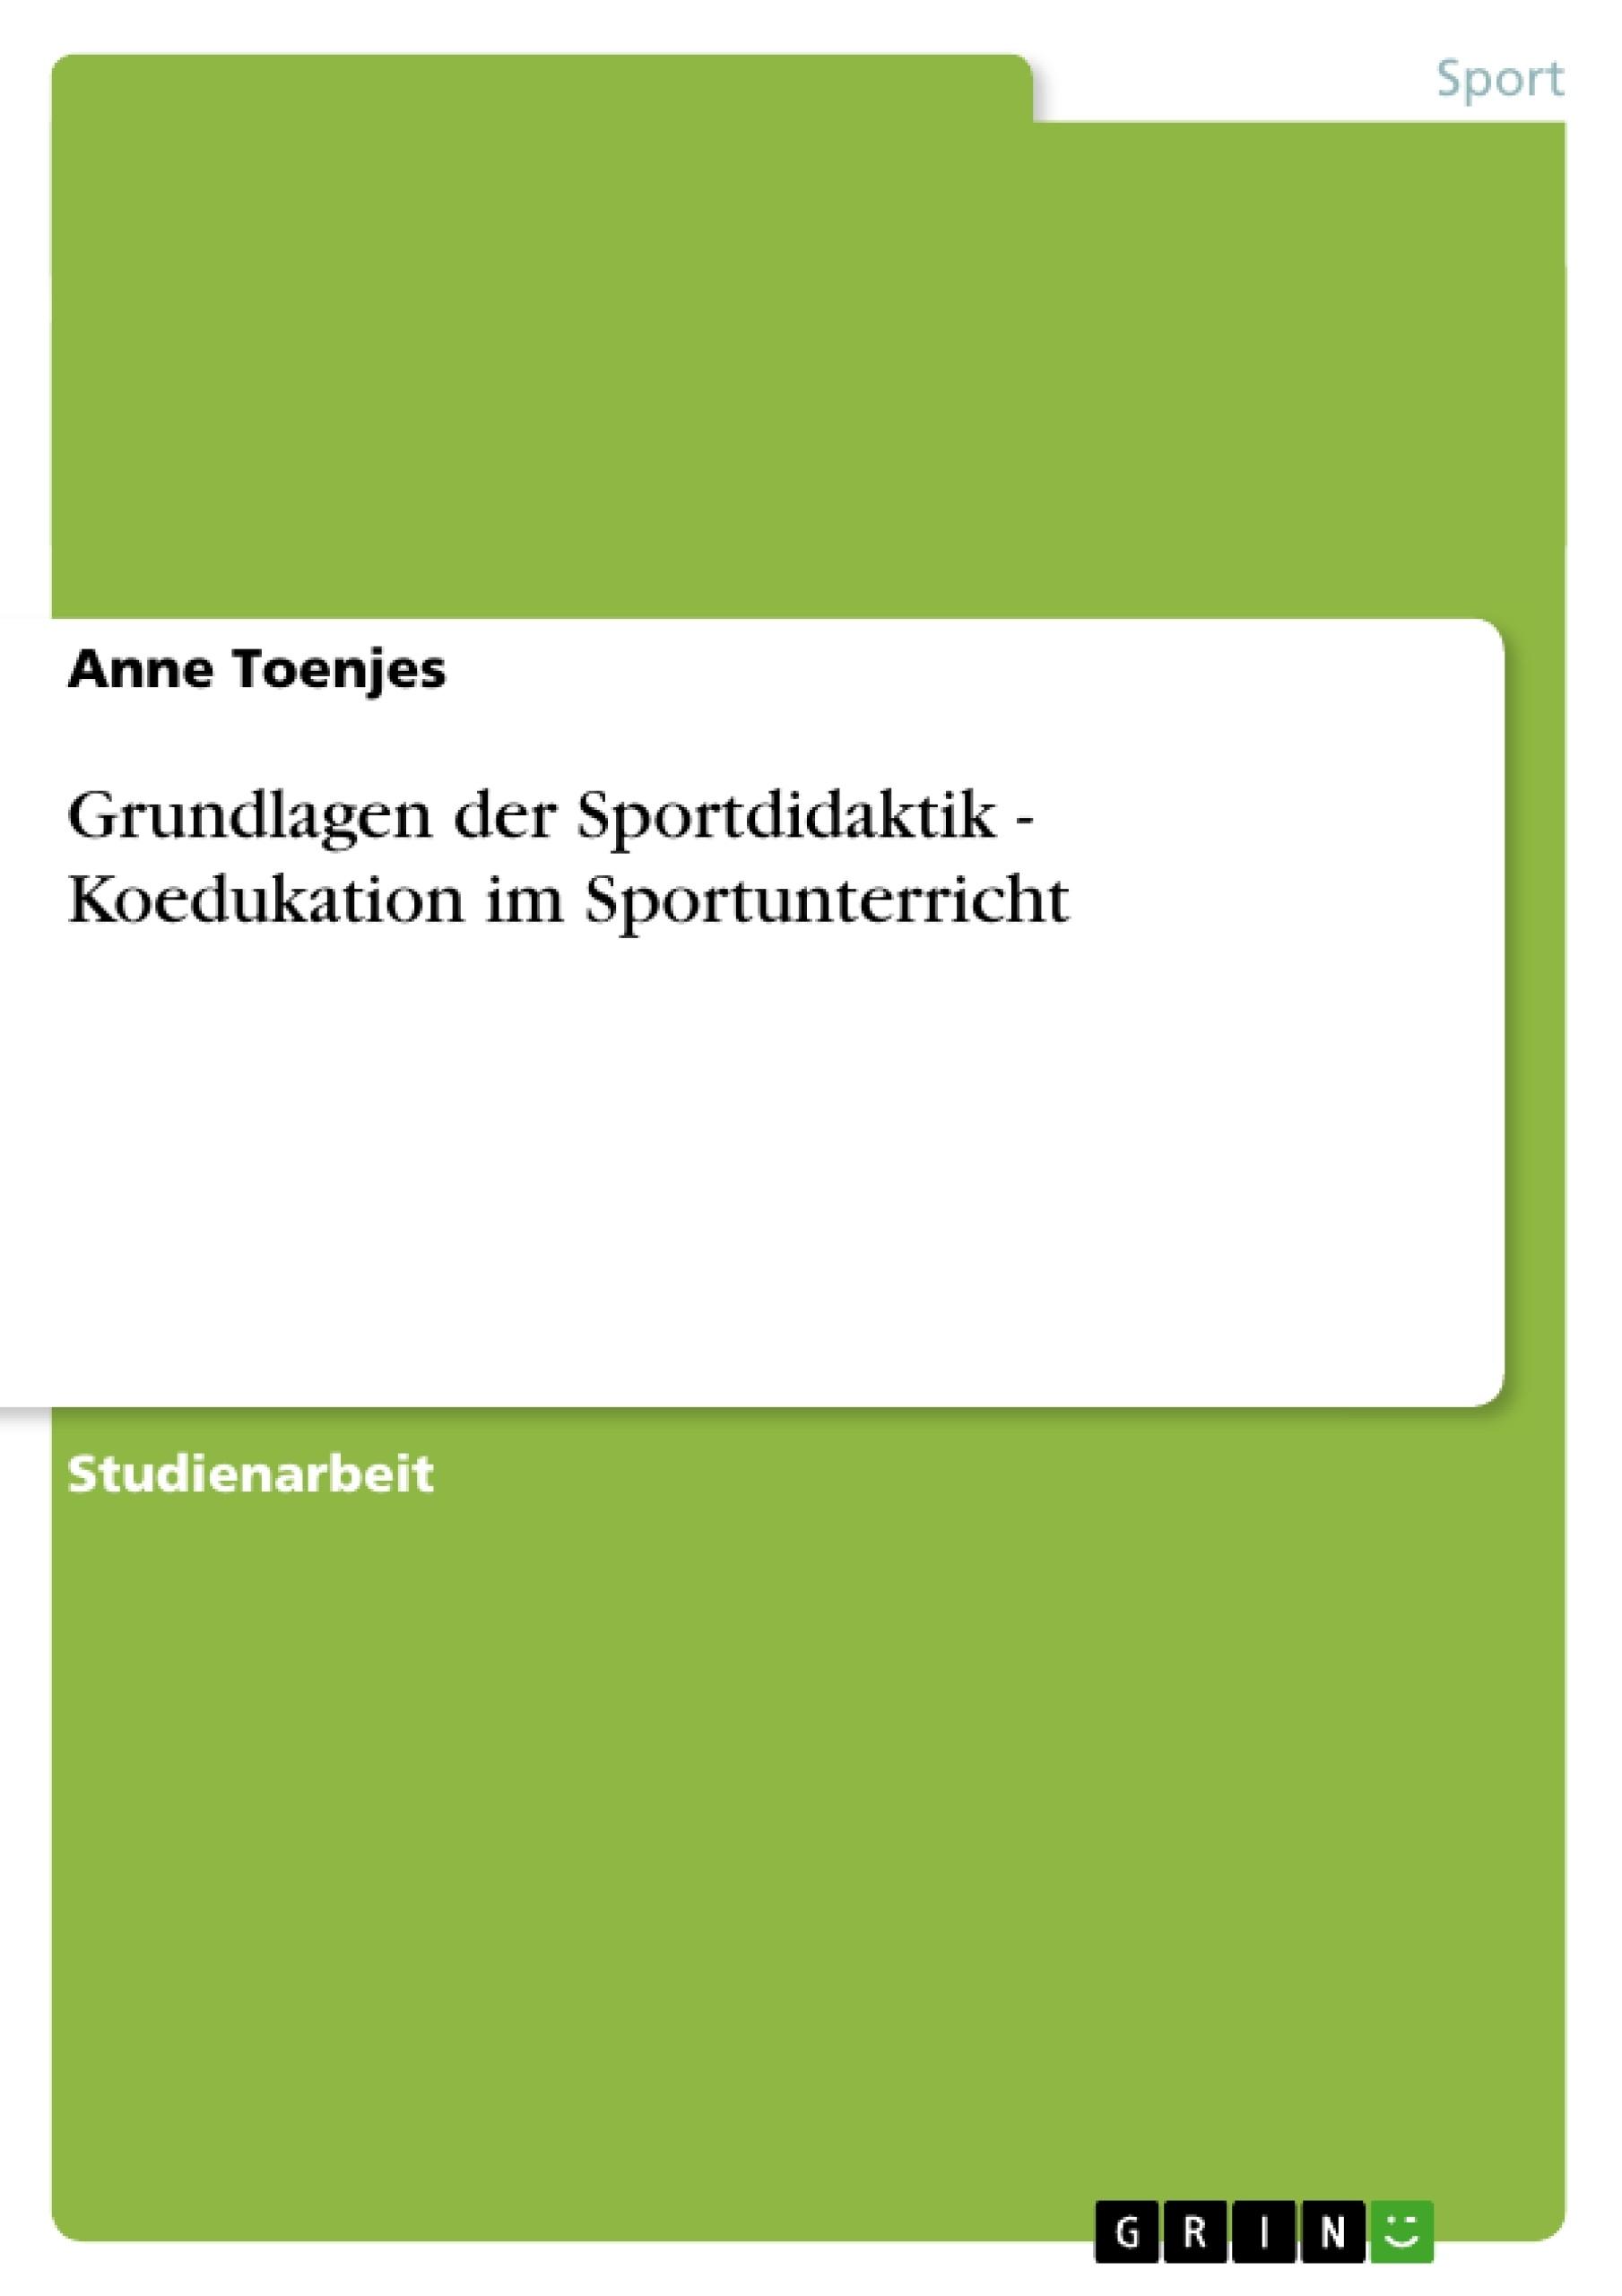 Titel: Grundlagen der Sportdidaktik - Koedukation im Sportunterricht